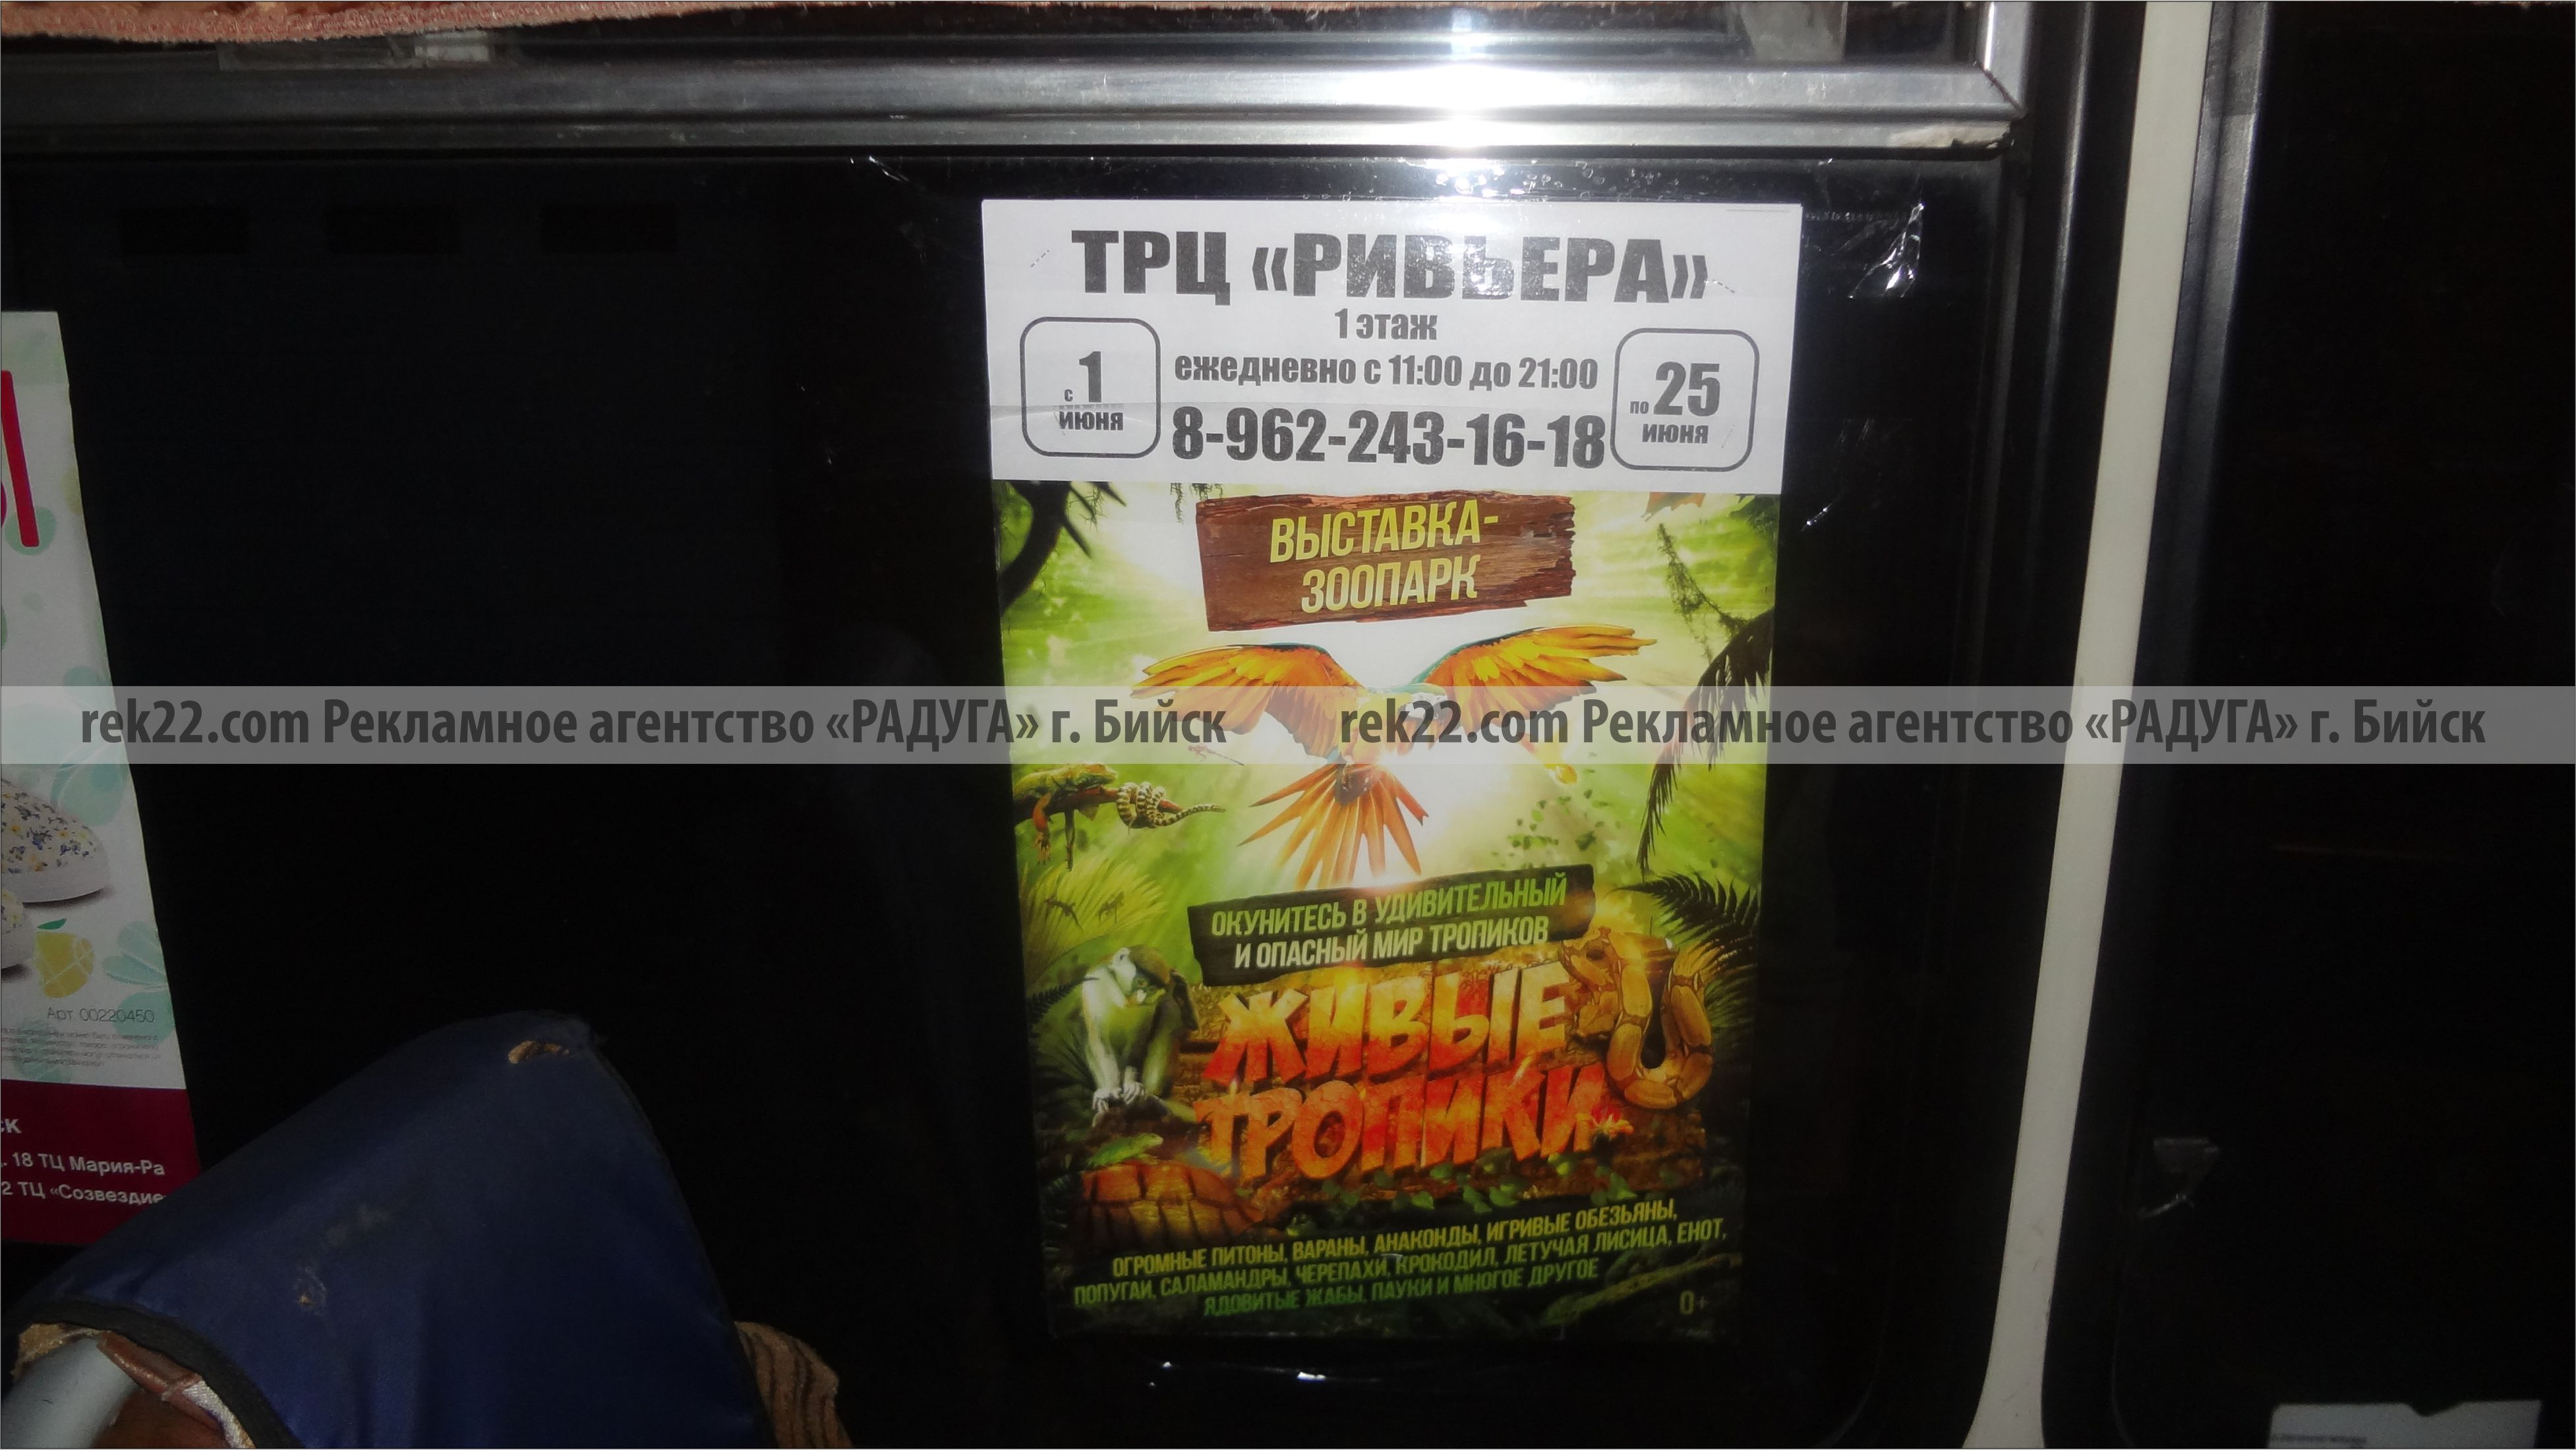 Реклама на транспорте Бийск - листовки - 6